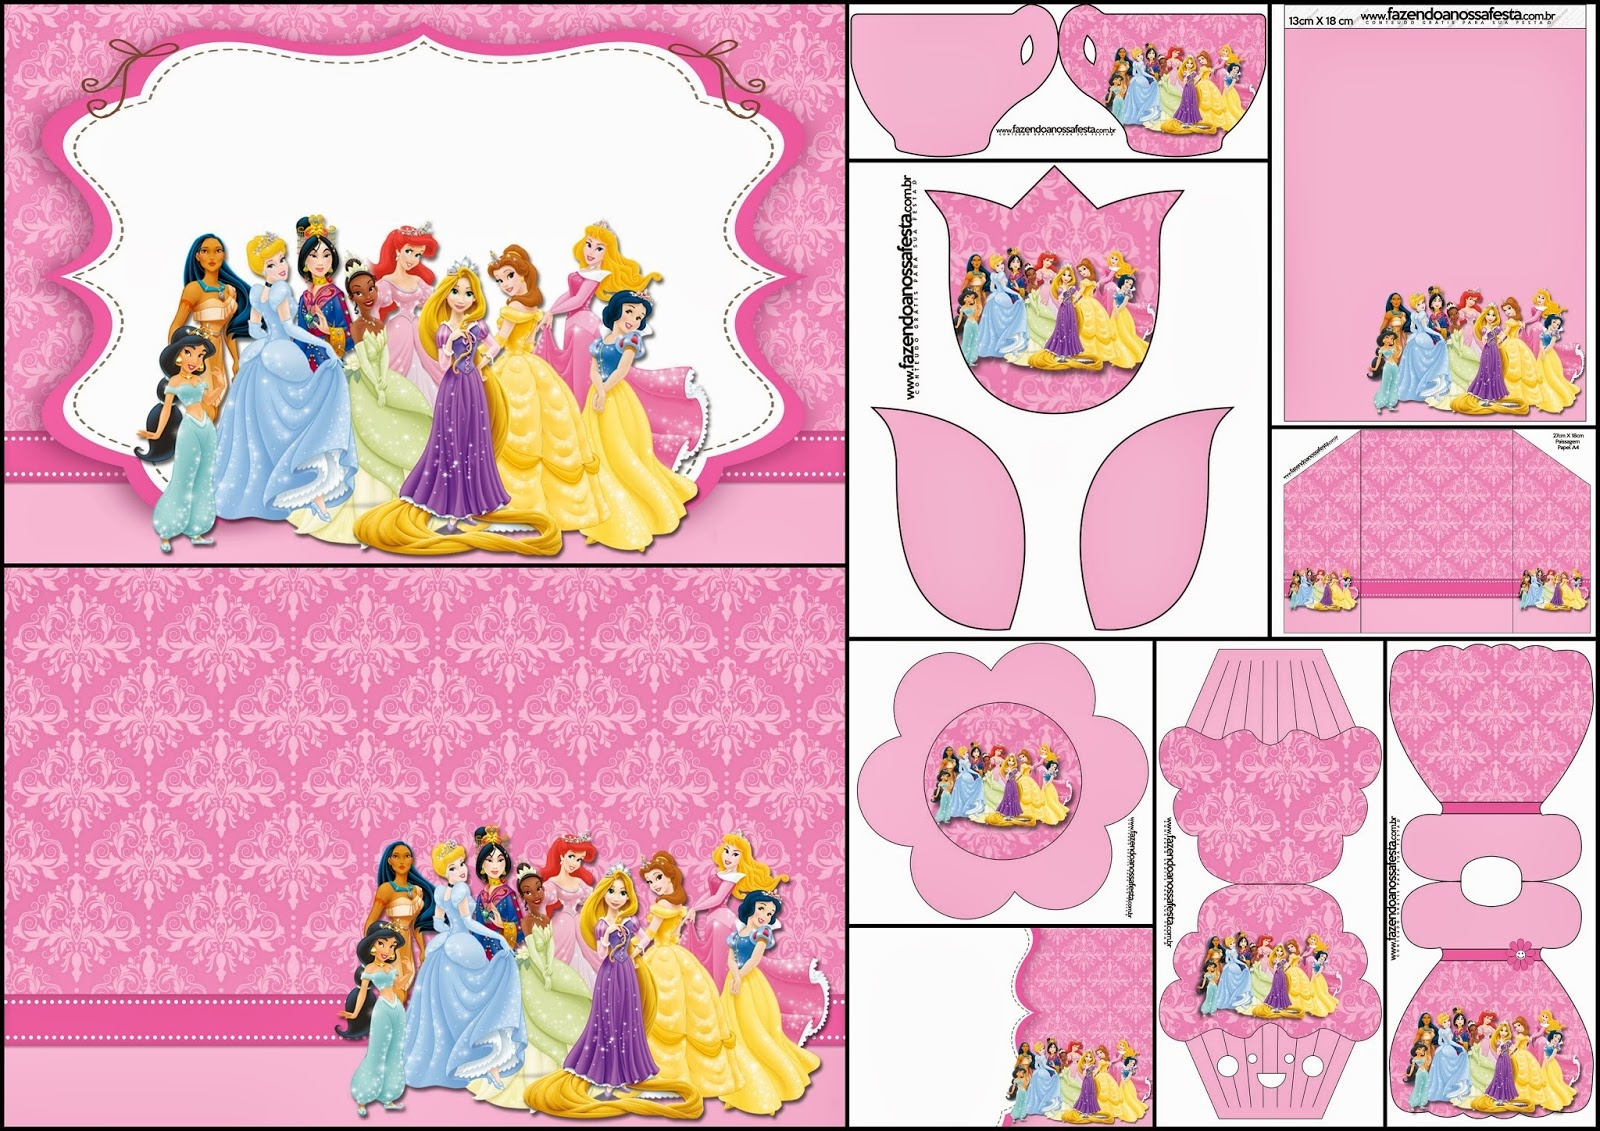 Disney Princess Party: Free Printable Party Invitations. - Oh My - Disney Princess Free Printable Invitations